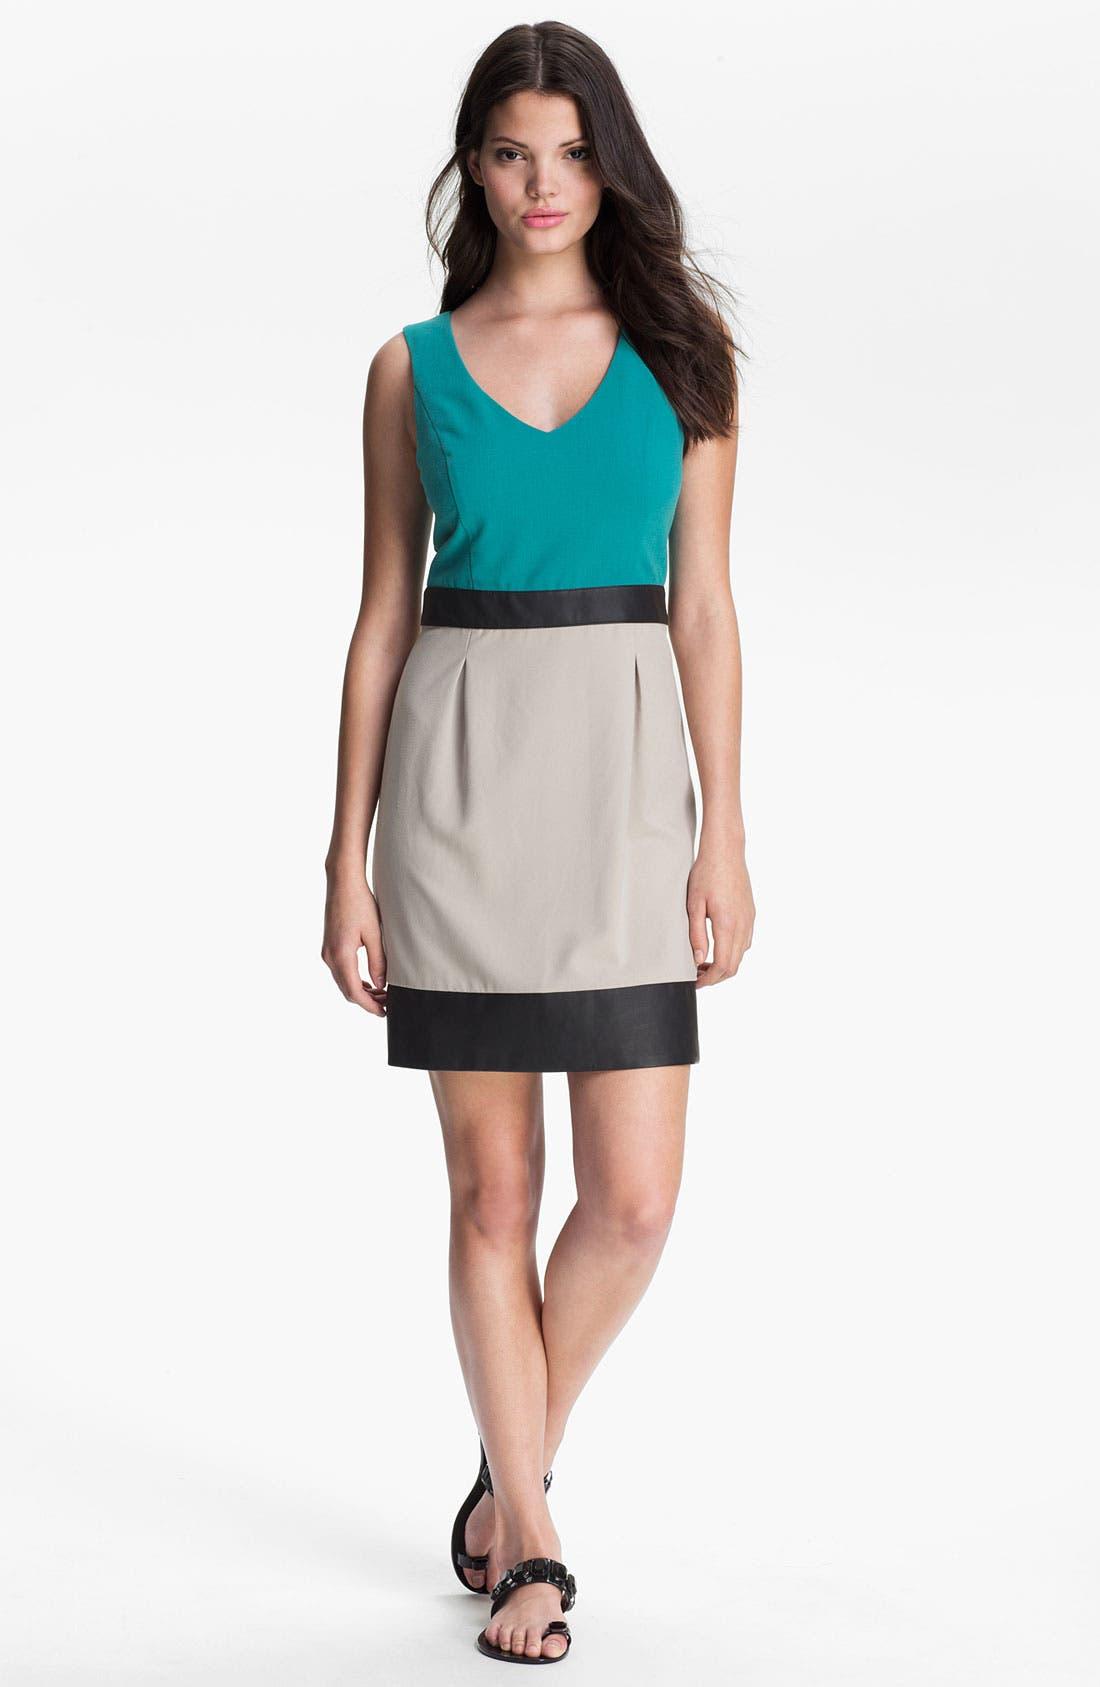 Main Image - Kensie Faux Leather Trim Colorblock Dress